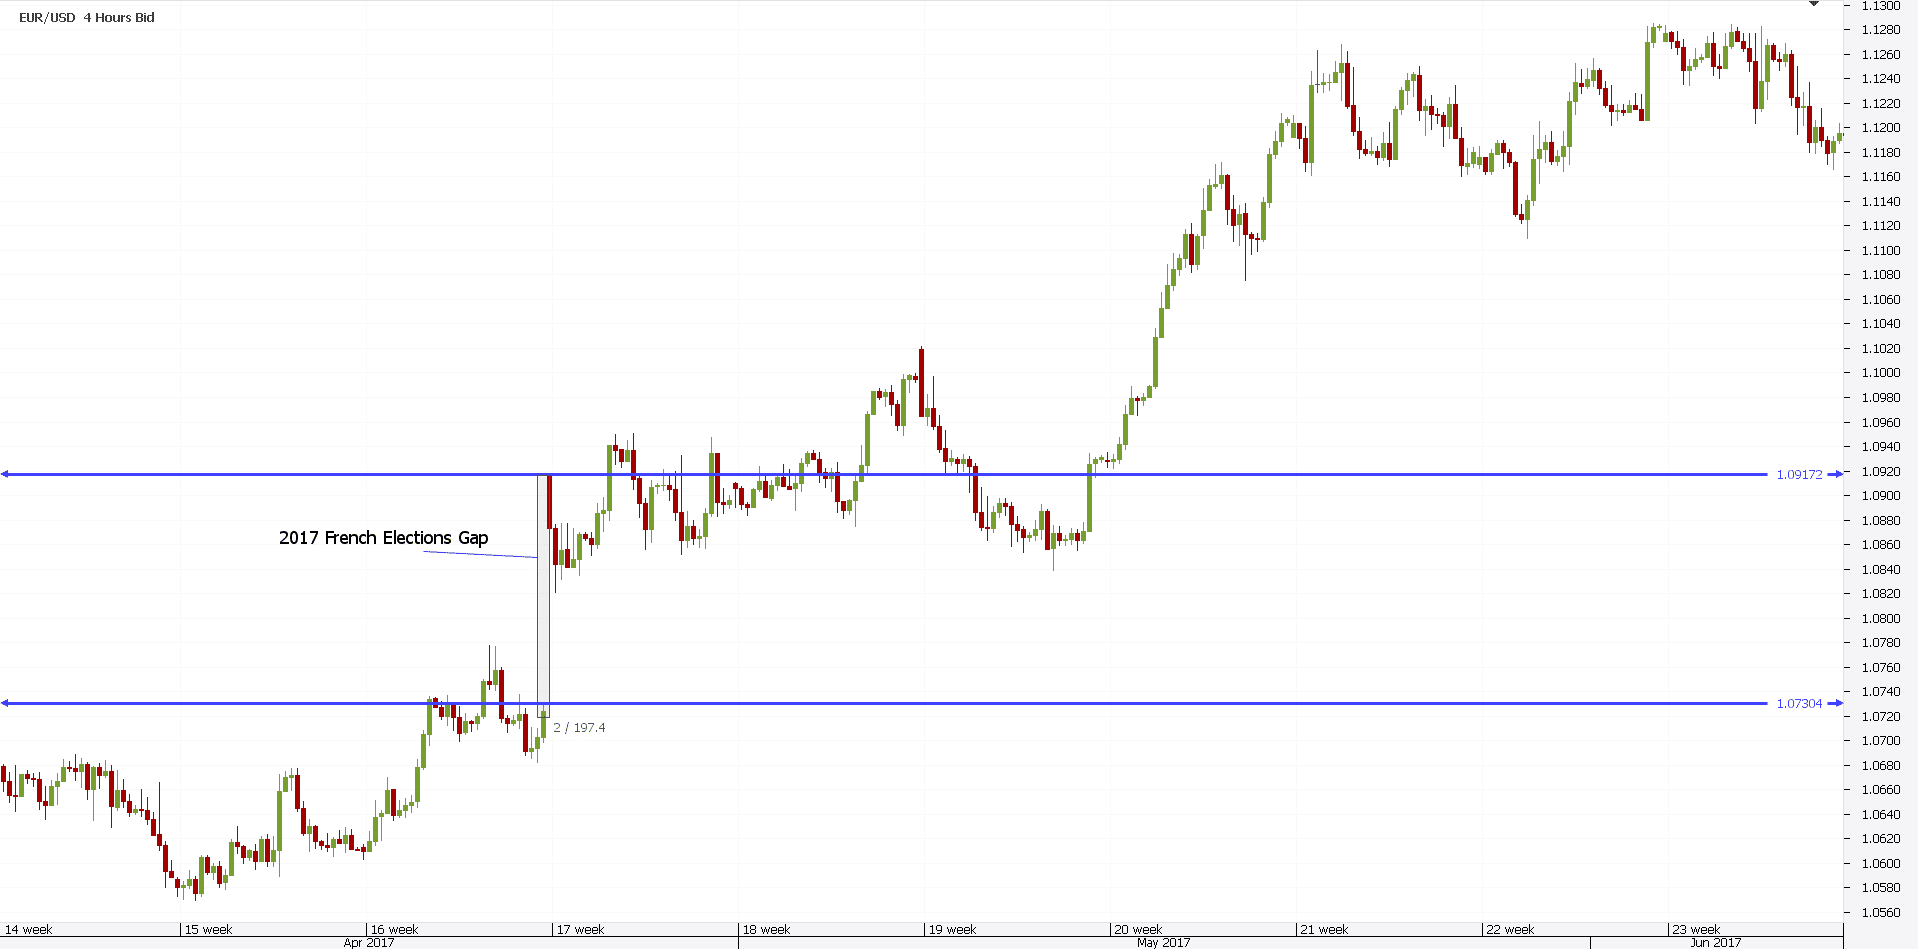 Day Trading Gaps